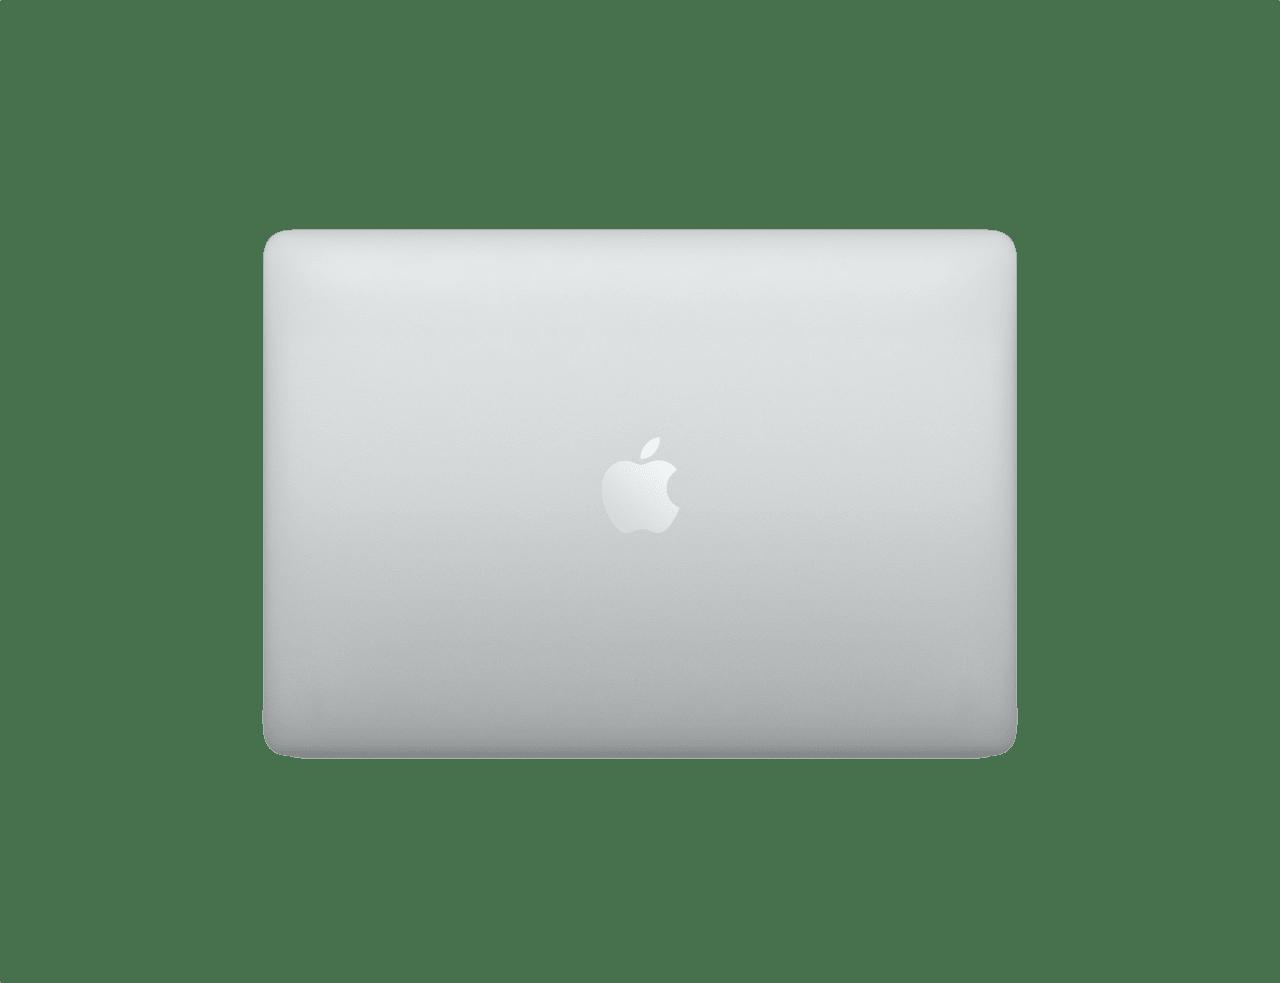 "Silver Apple 13"" MacBook Pro (Early 2020) Laptop - Intel® Core™ i5-8257U - 8GB - 512GB SSD - Intel® Iris™ Plus Graphics 645.3"